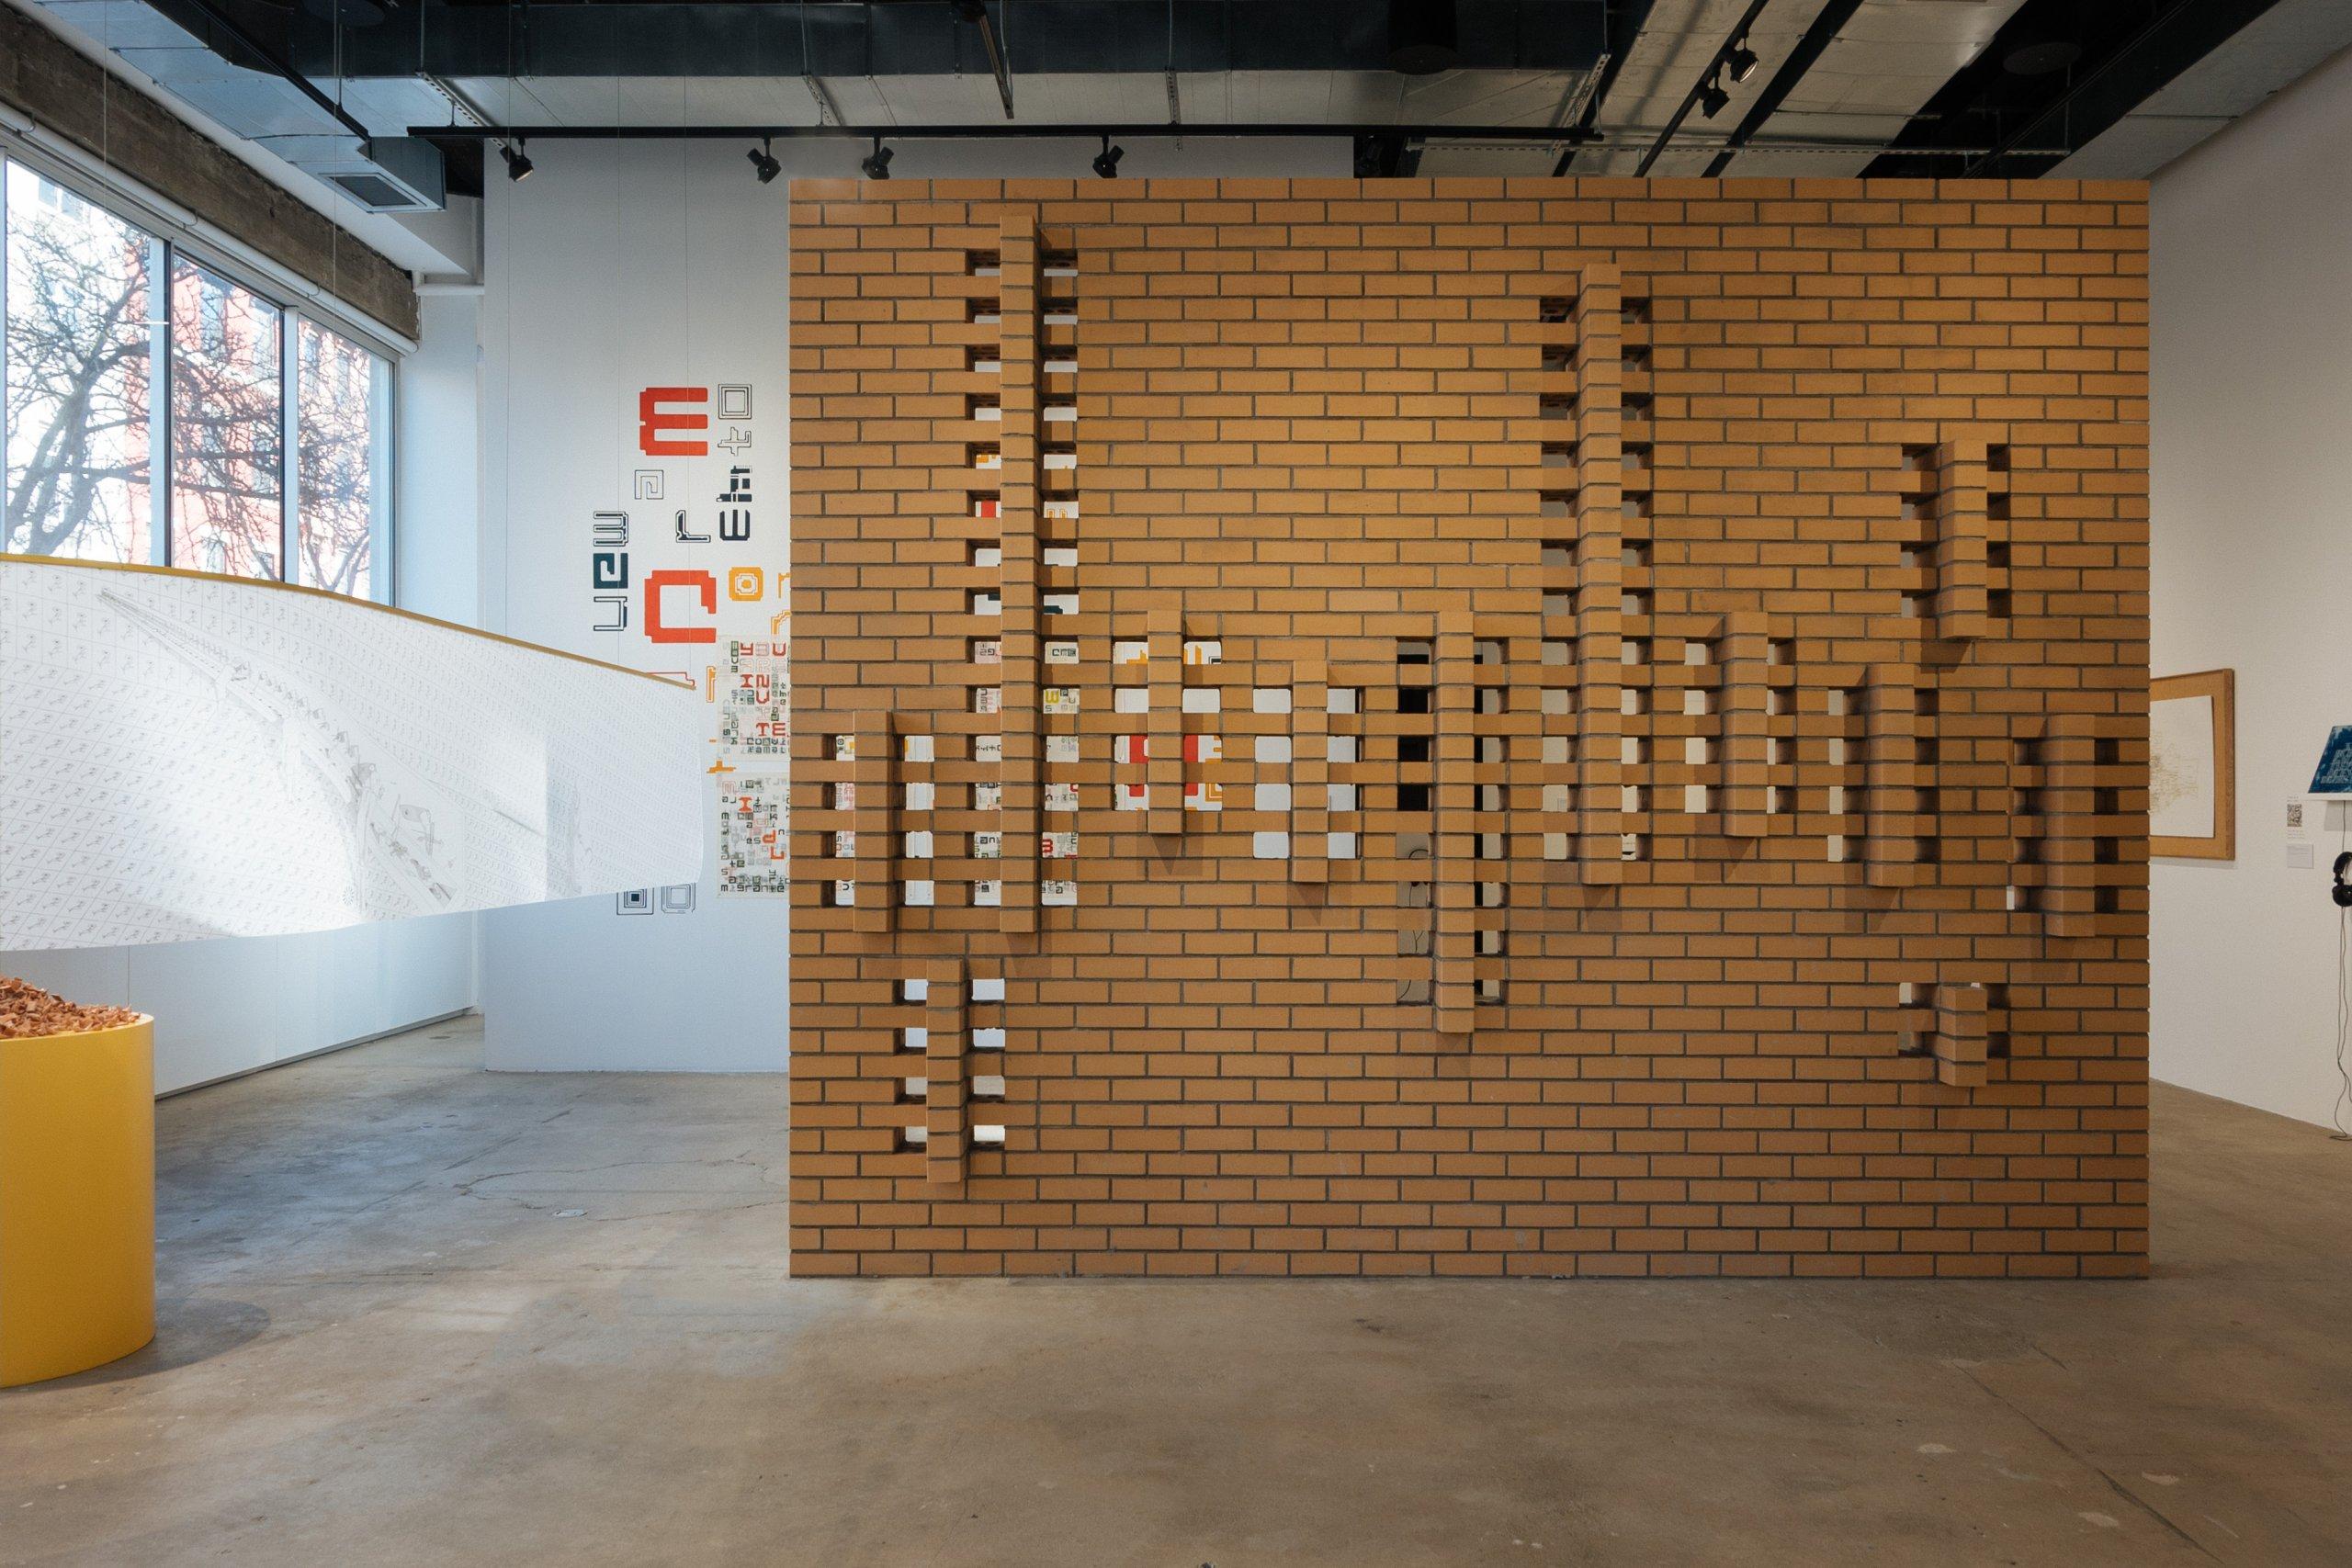 Alia Farid The Space Between Classrooms Swiss Institute Abdullah al Mutairi